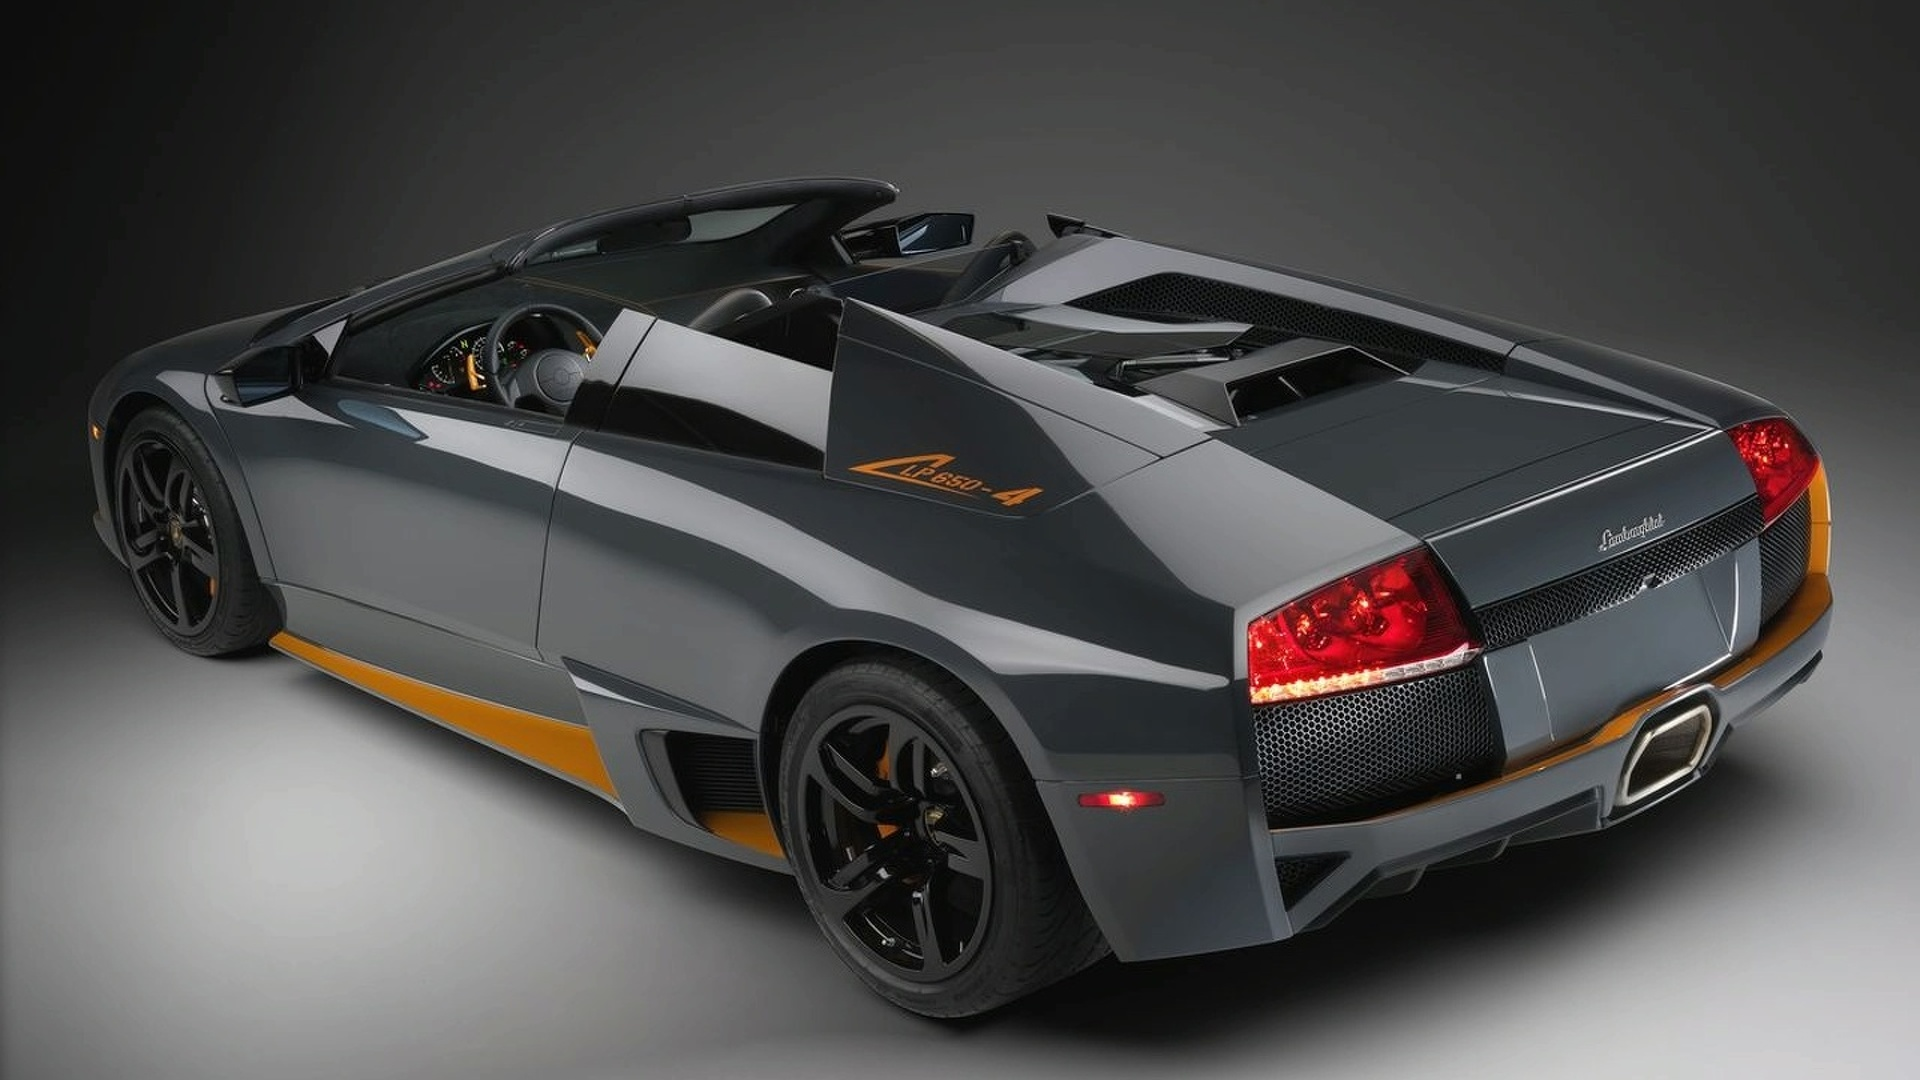 Lamborghini Murcielago LP650-4 Roadster First Official Photos Released